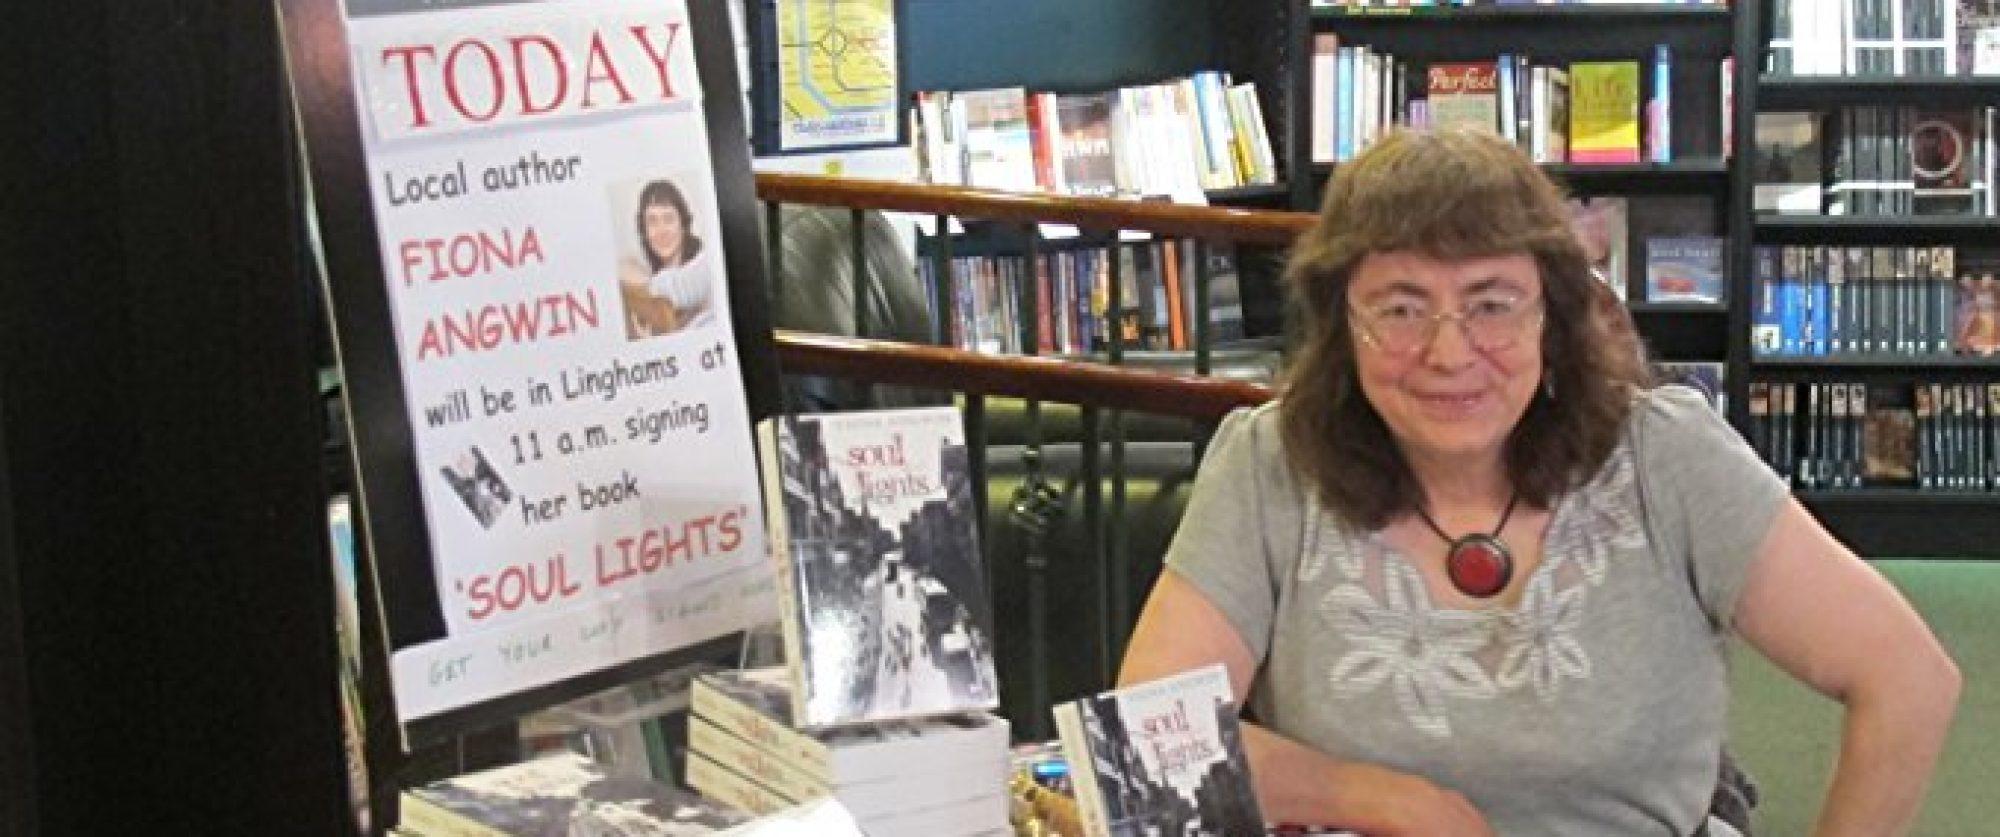 Fiona Angwin - Writer